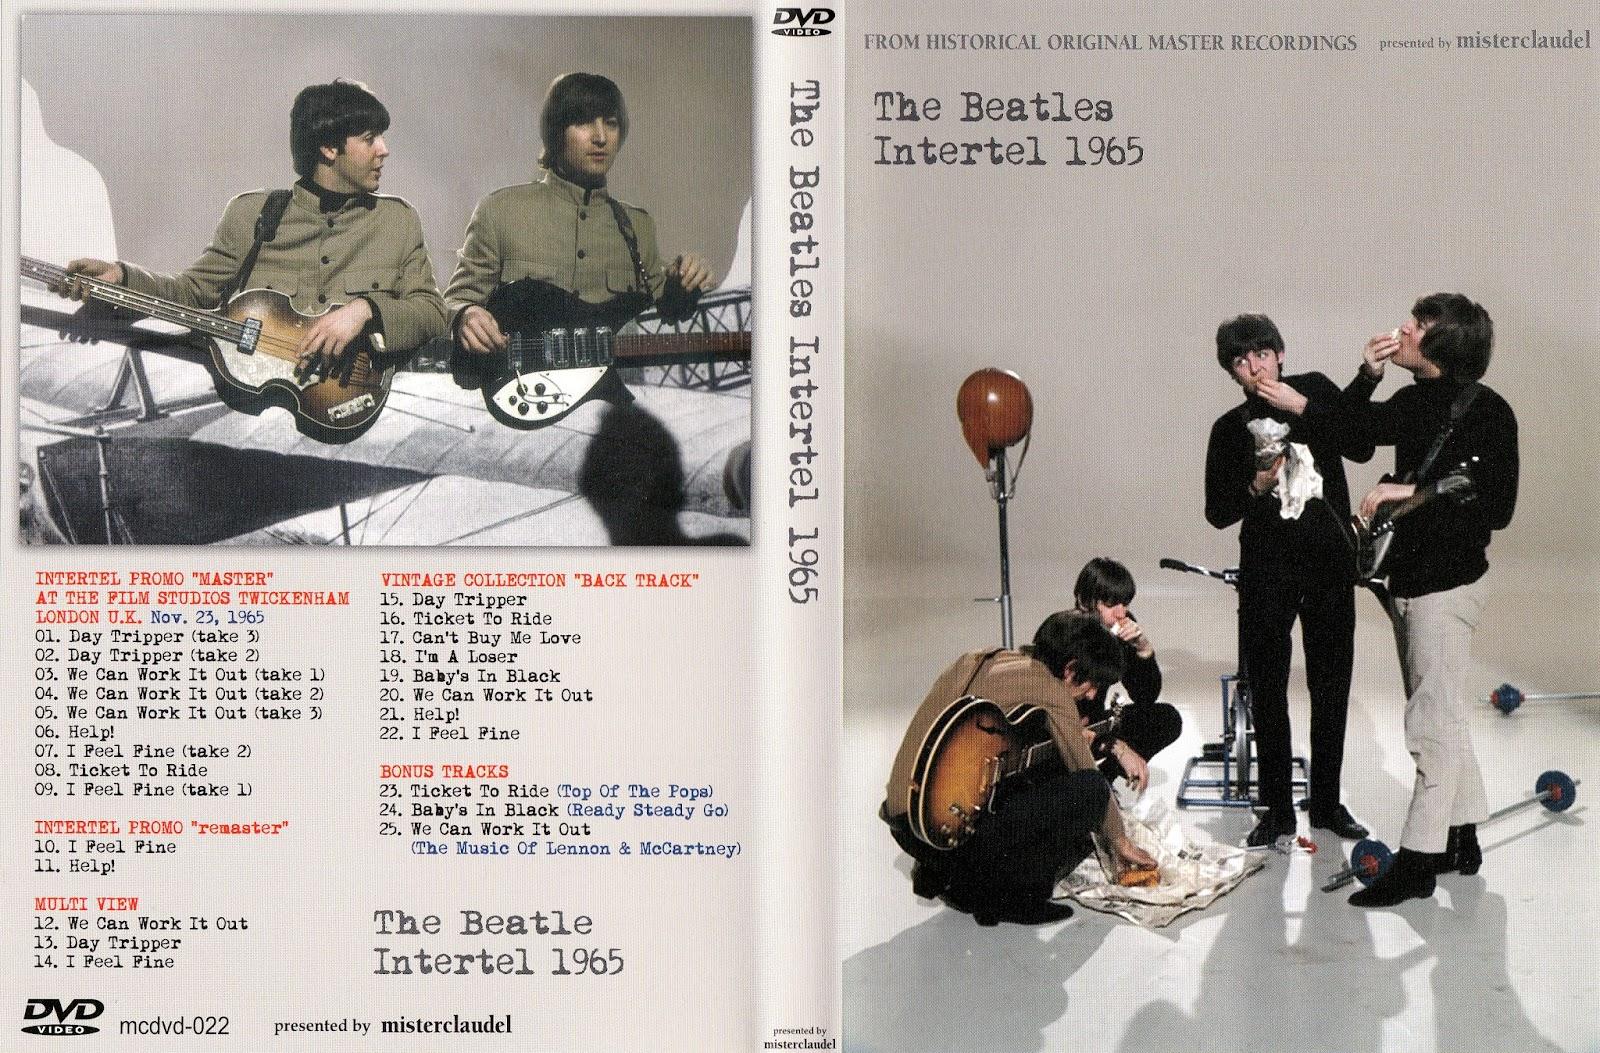 The Beatles - Intertel 1965 DVD